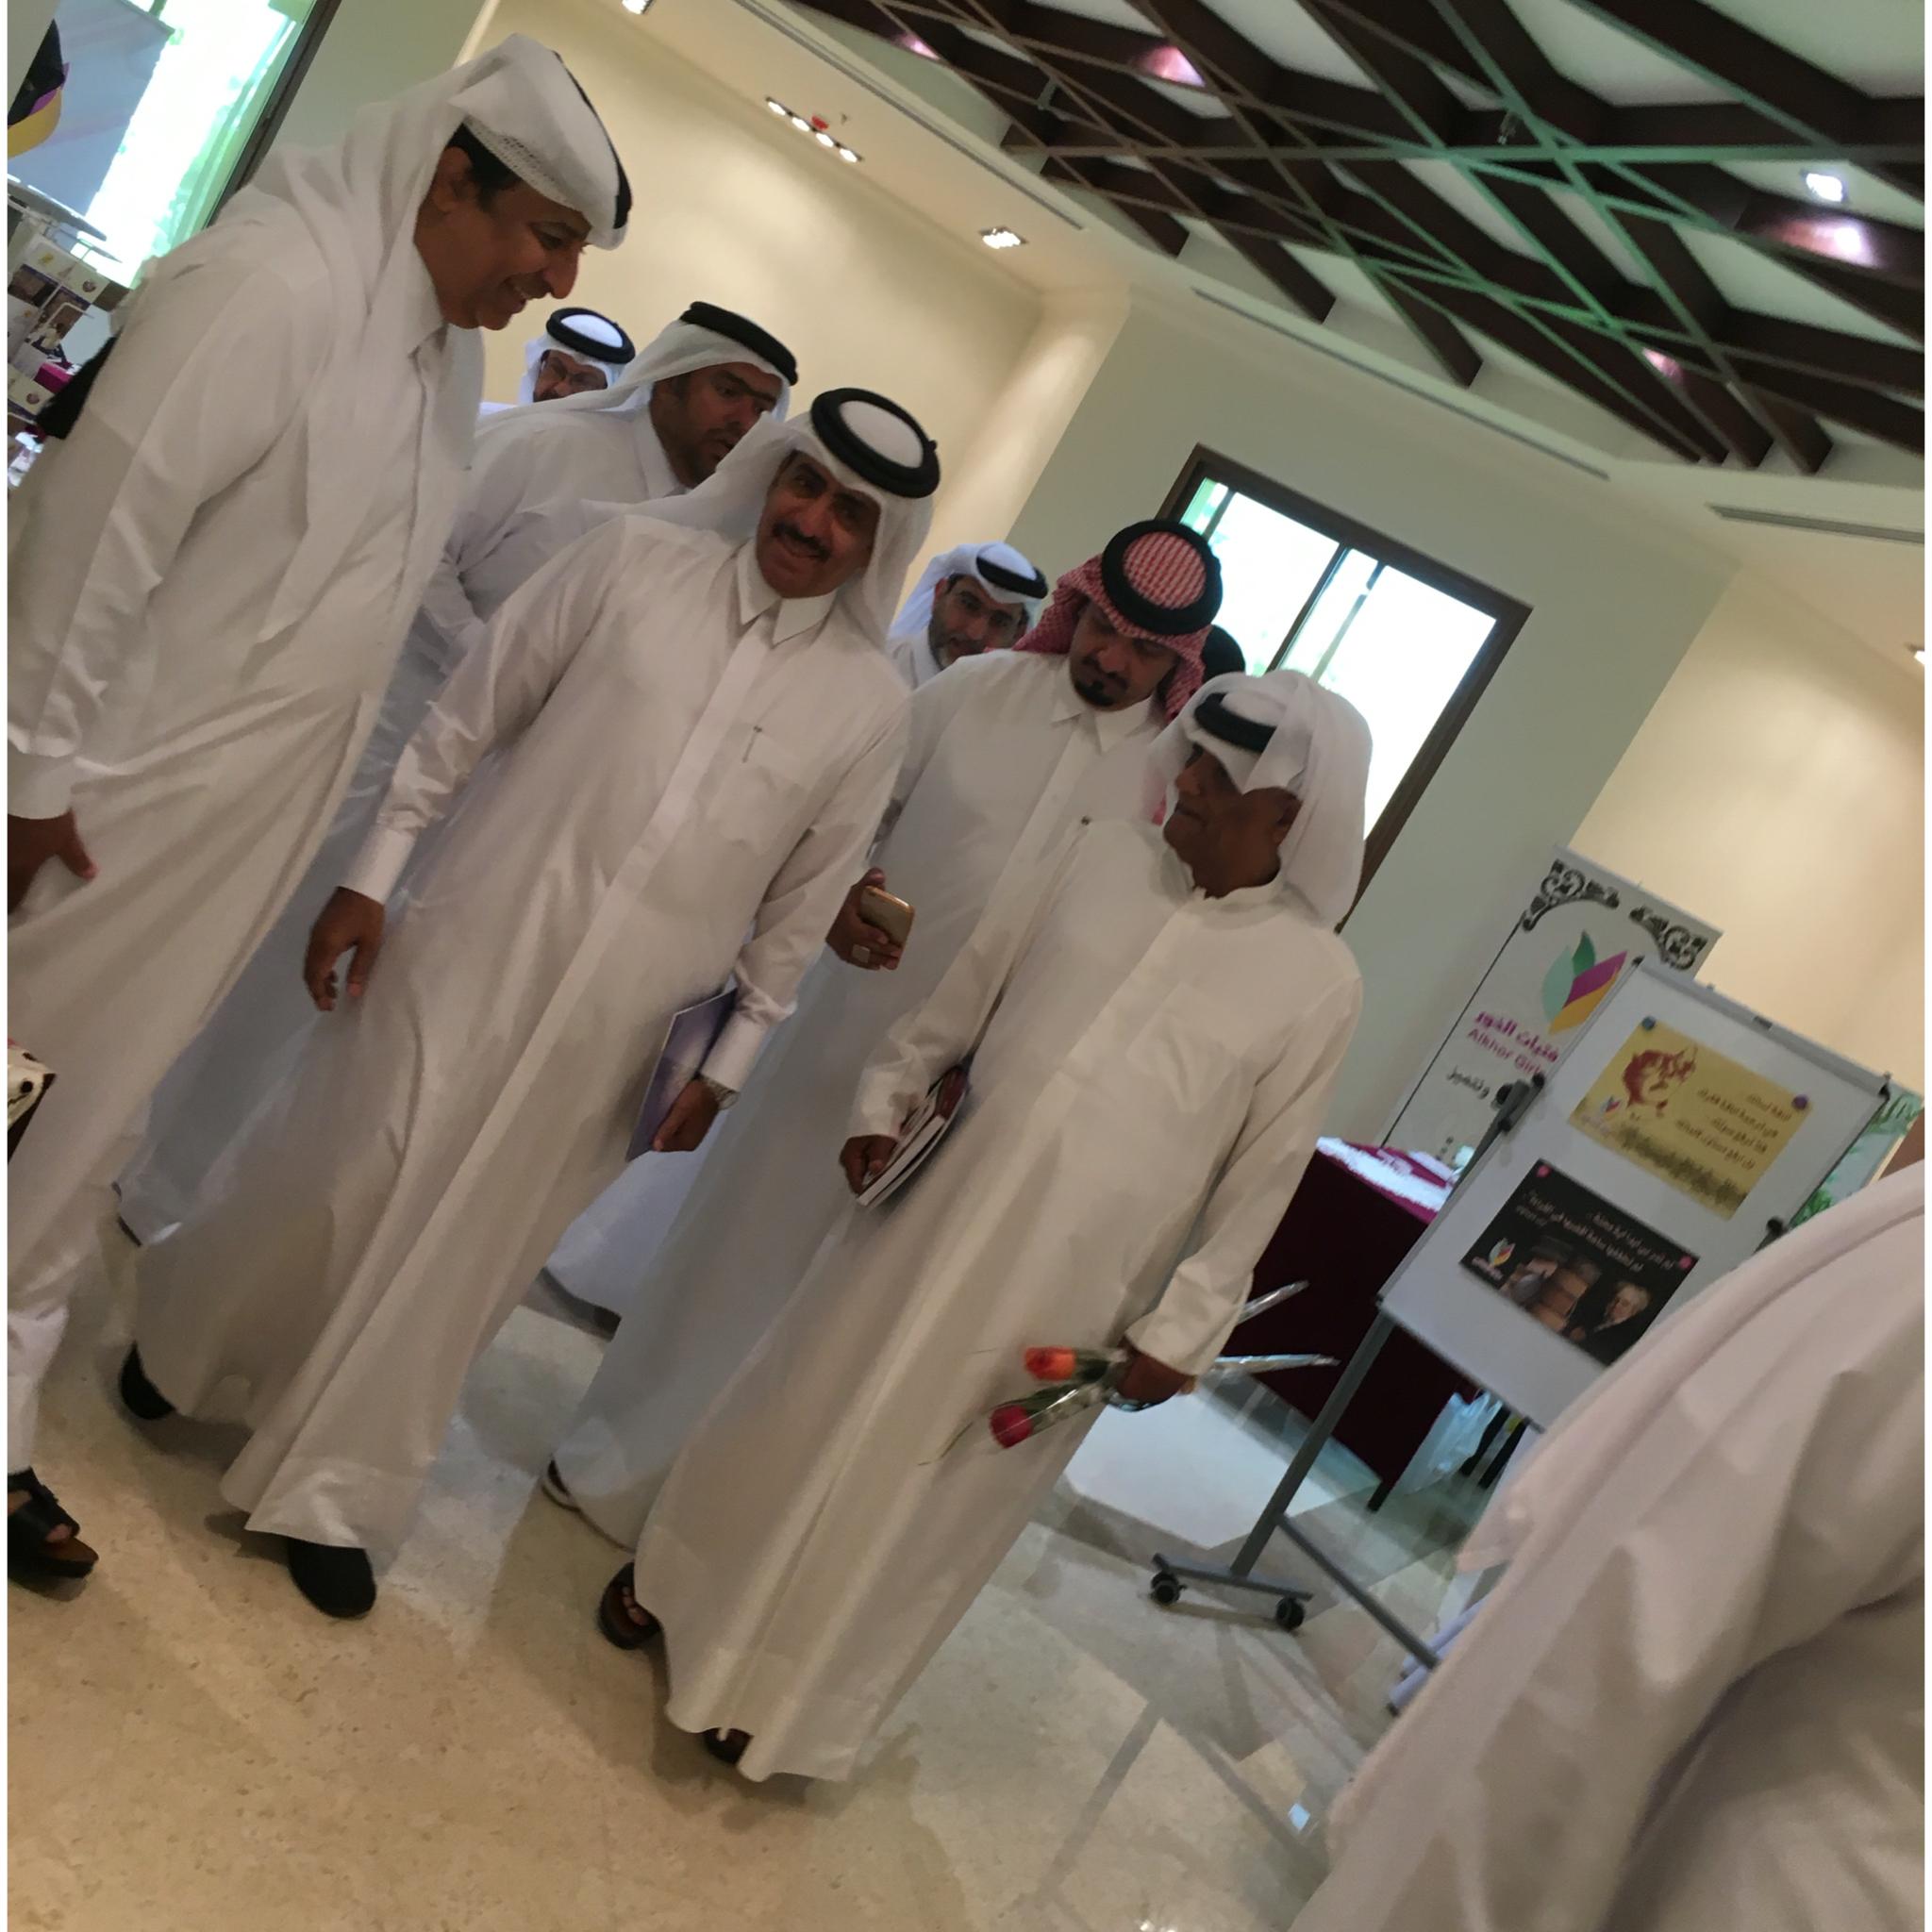 Post girls Khor Al Khor exhibition center for the book in 2016